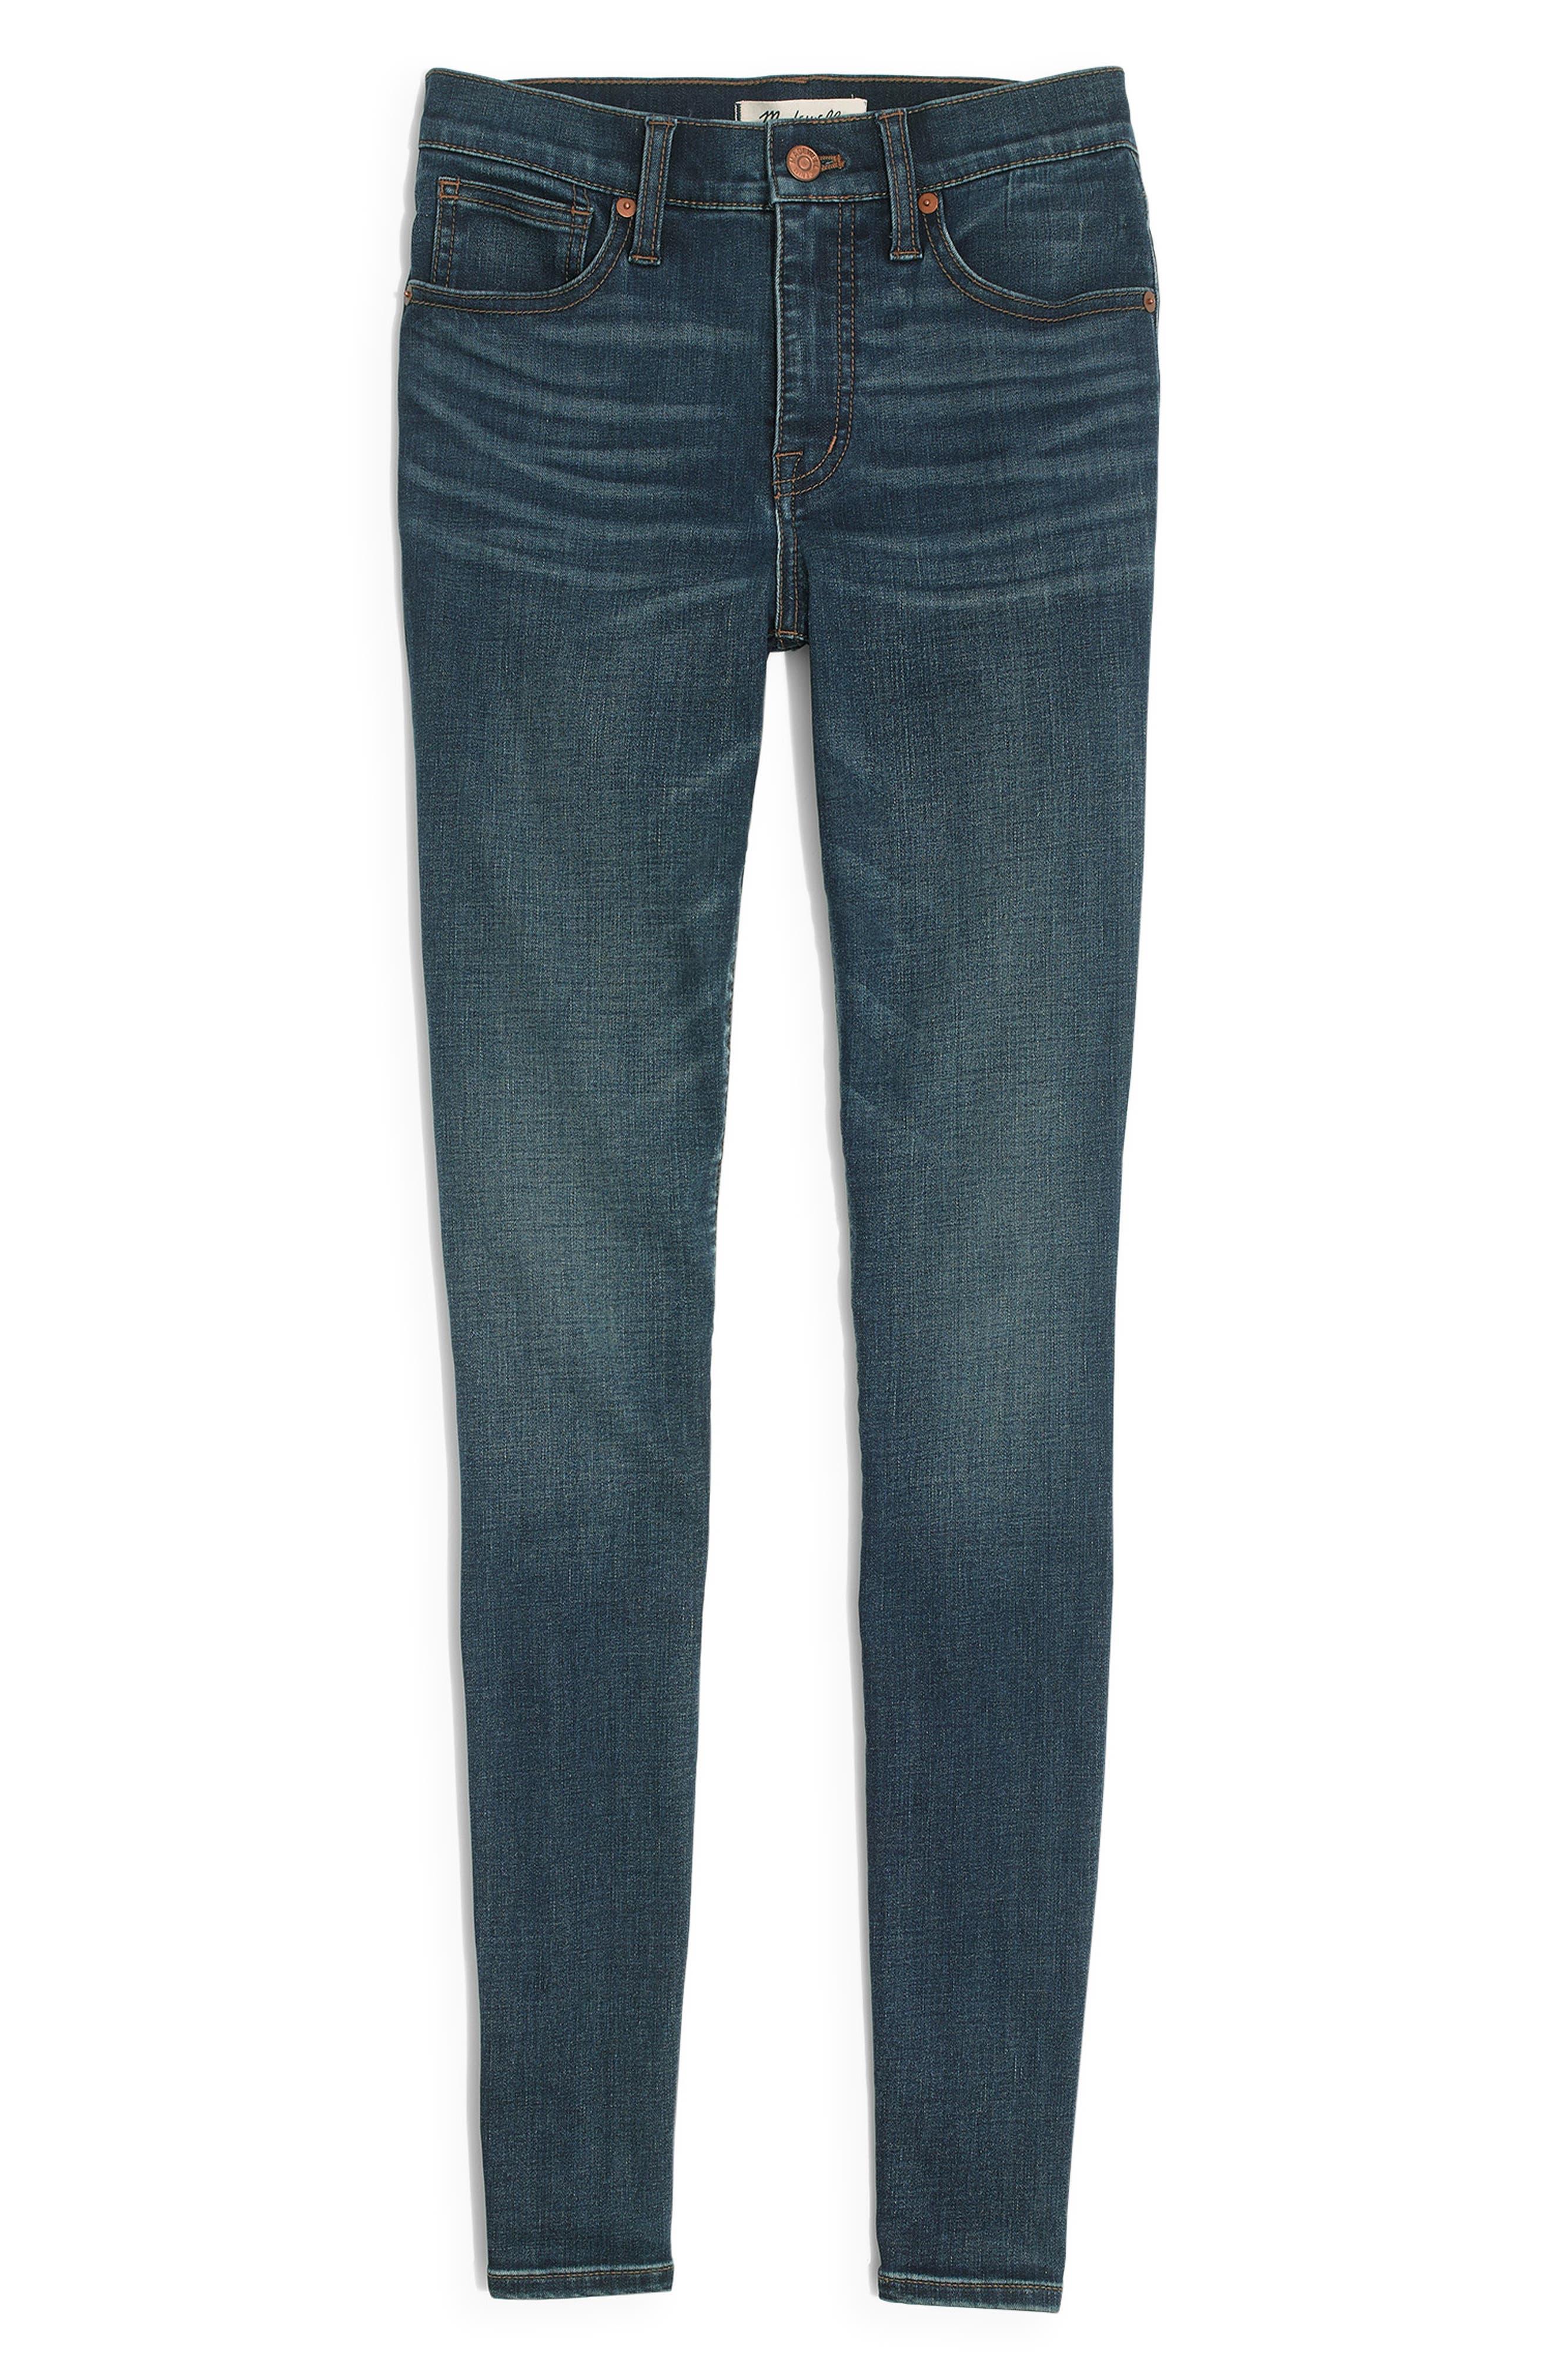 MADEWELL 10-Inch High Waist Skinny Jeans, Main, color, TARREN